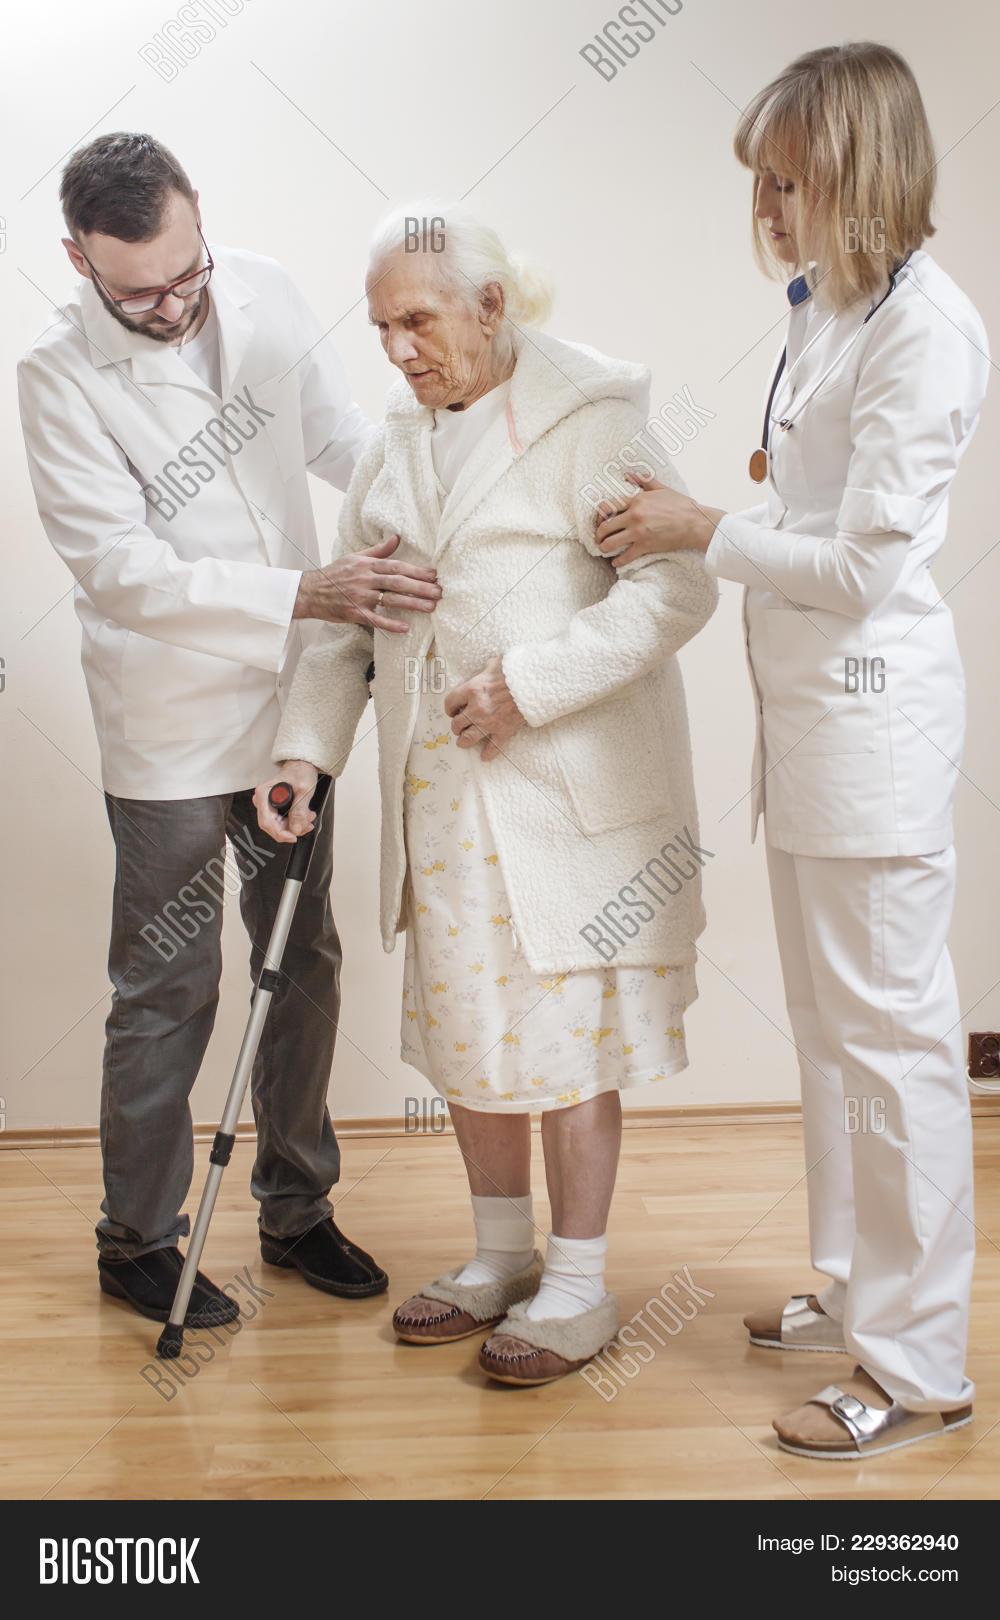 Doctor Nurse Belay Image & Photo (Free Trial) | Bigstock